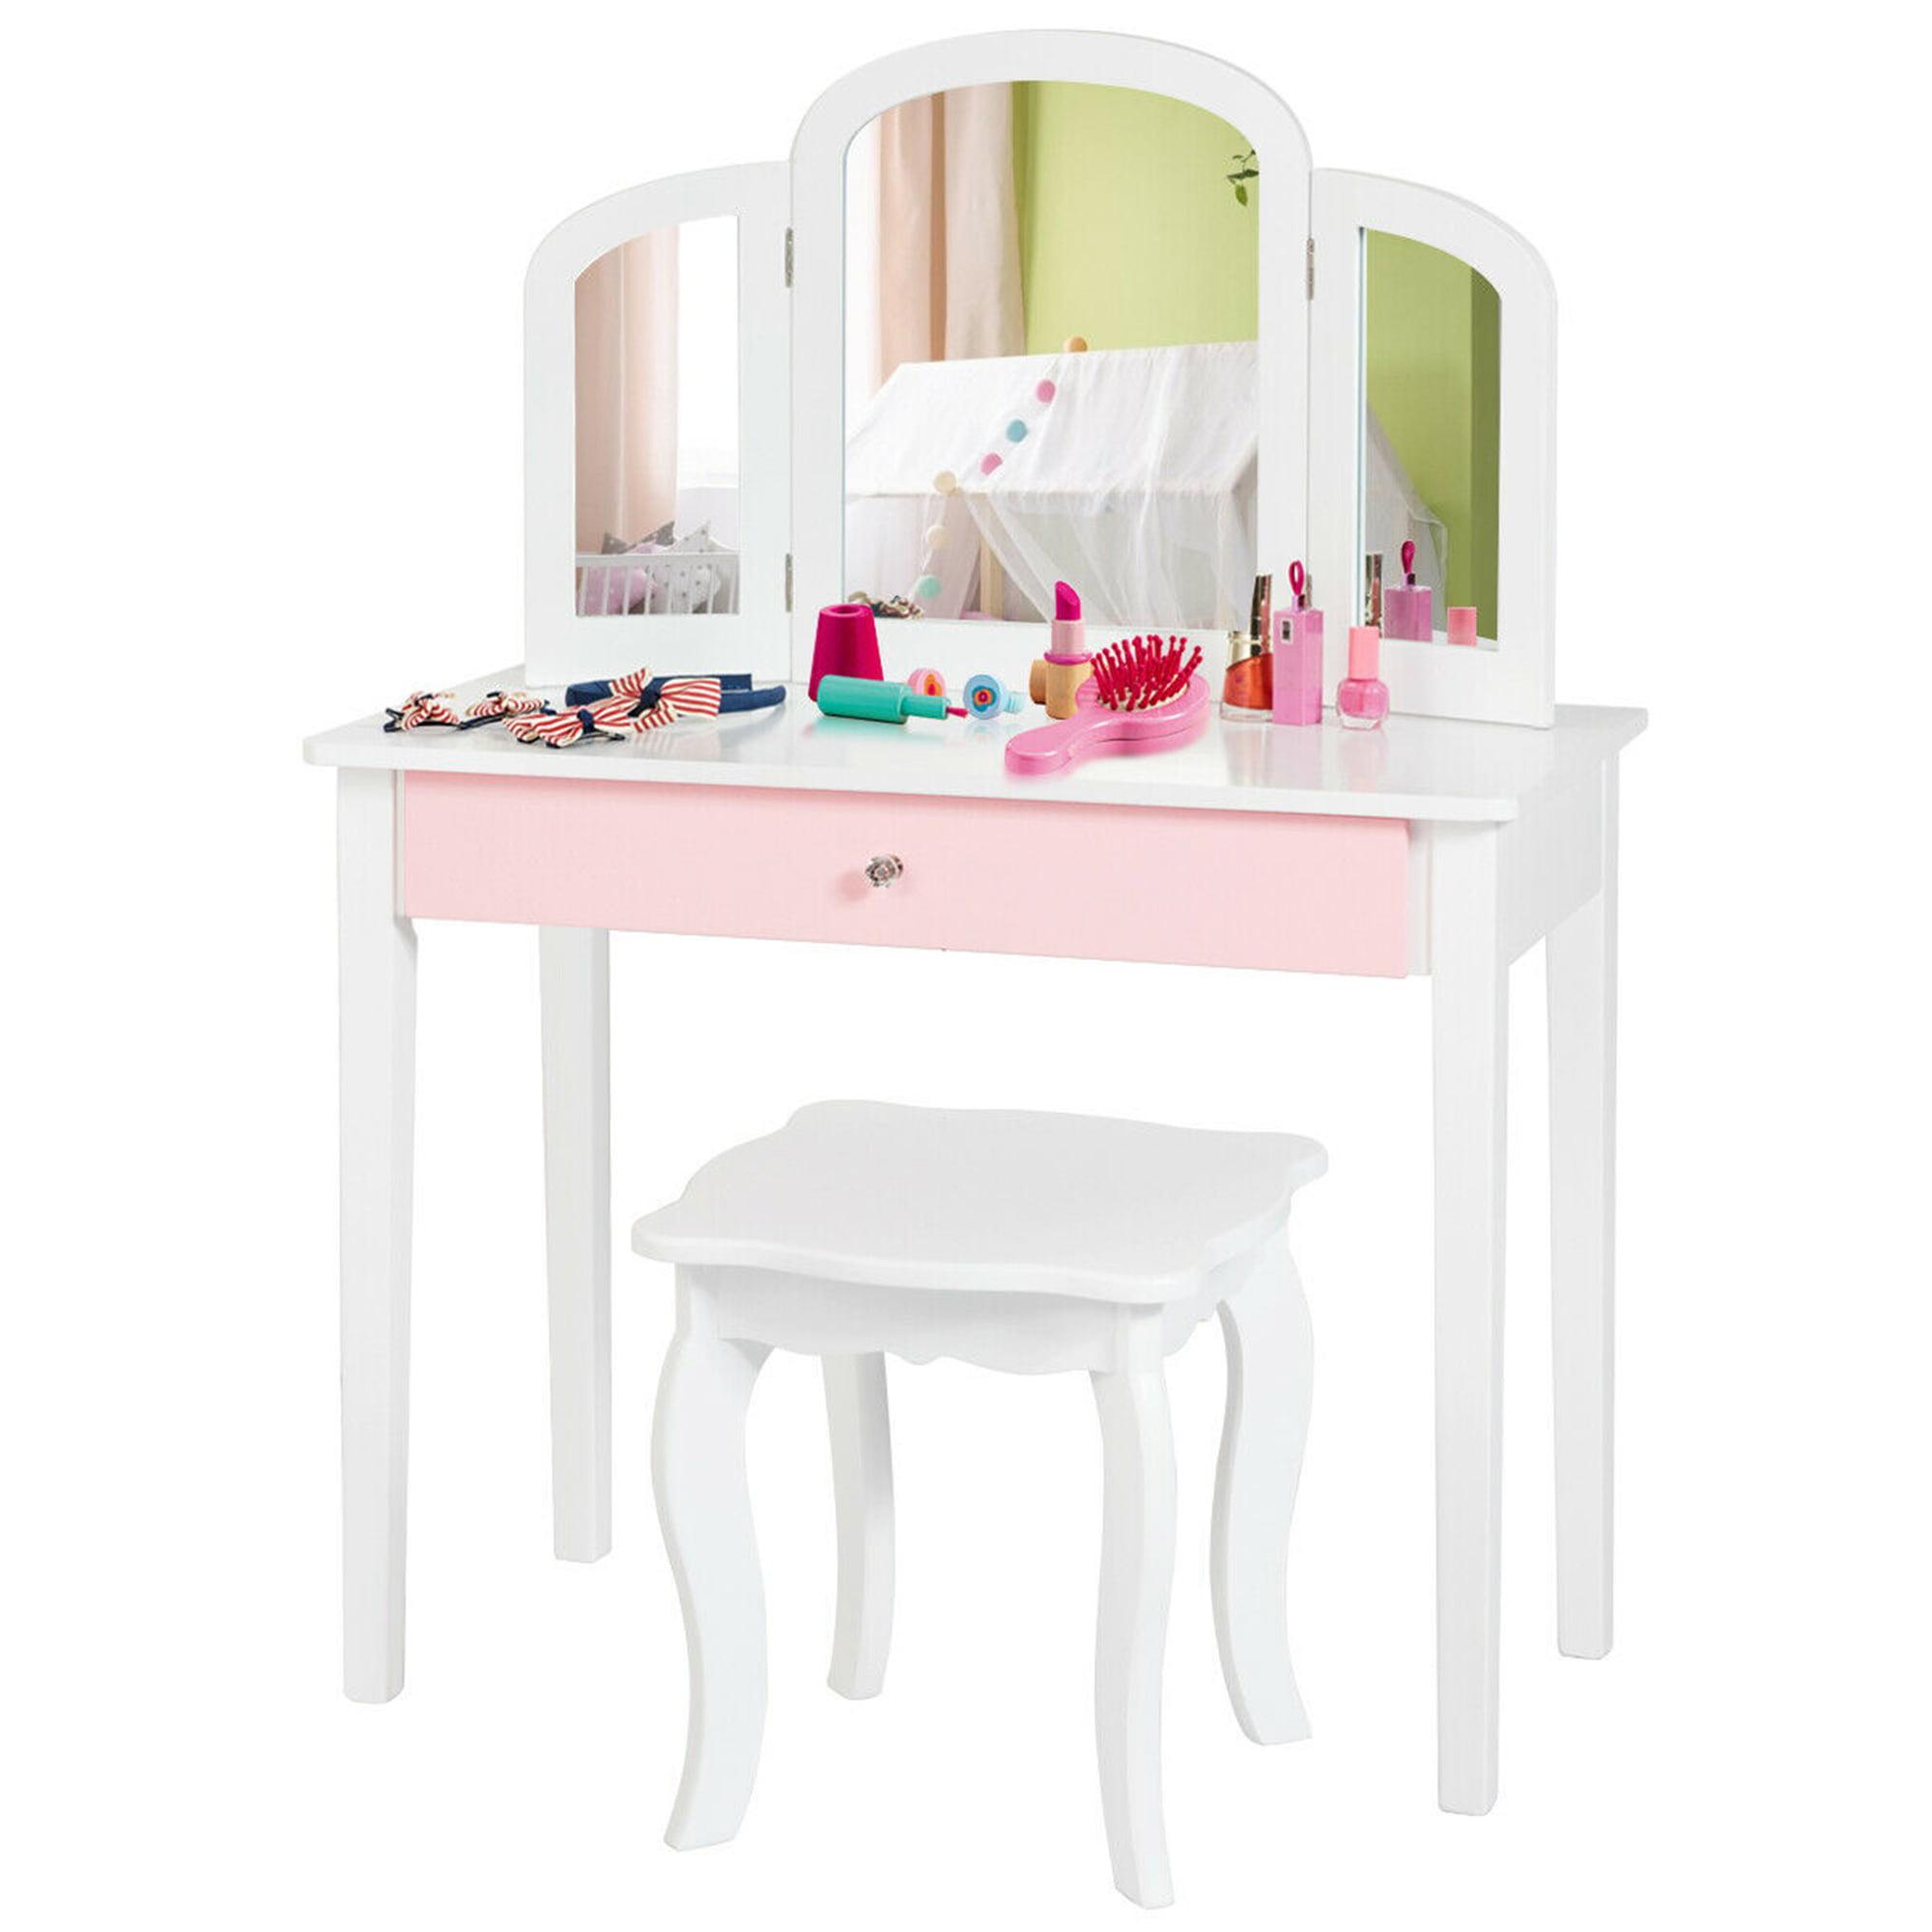 Gymax Kids Vanity Princess Make Up Dressing Table W Tri Folding Mirror Chair White Walmart Com Walmart Com